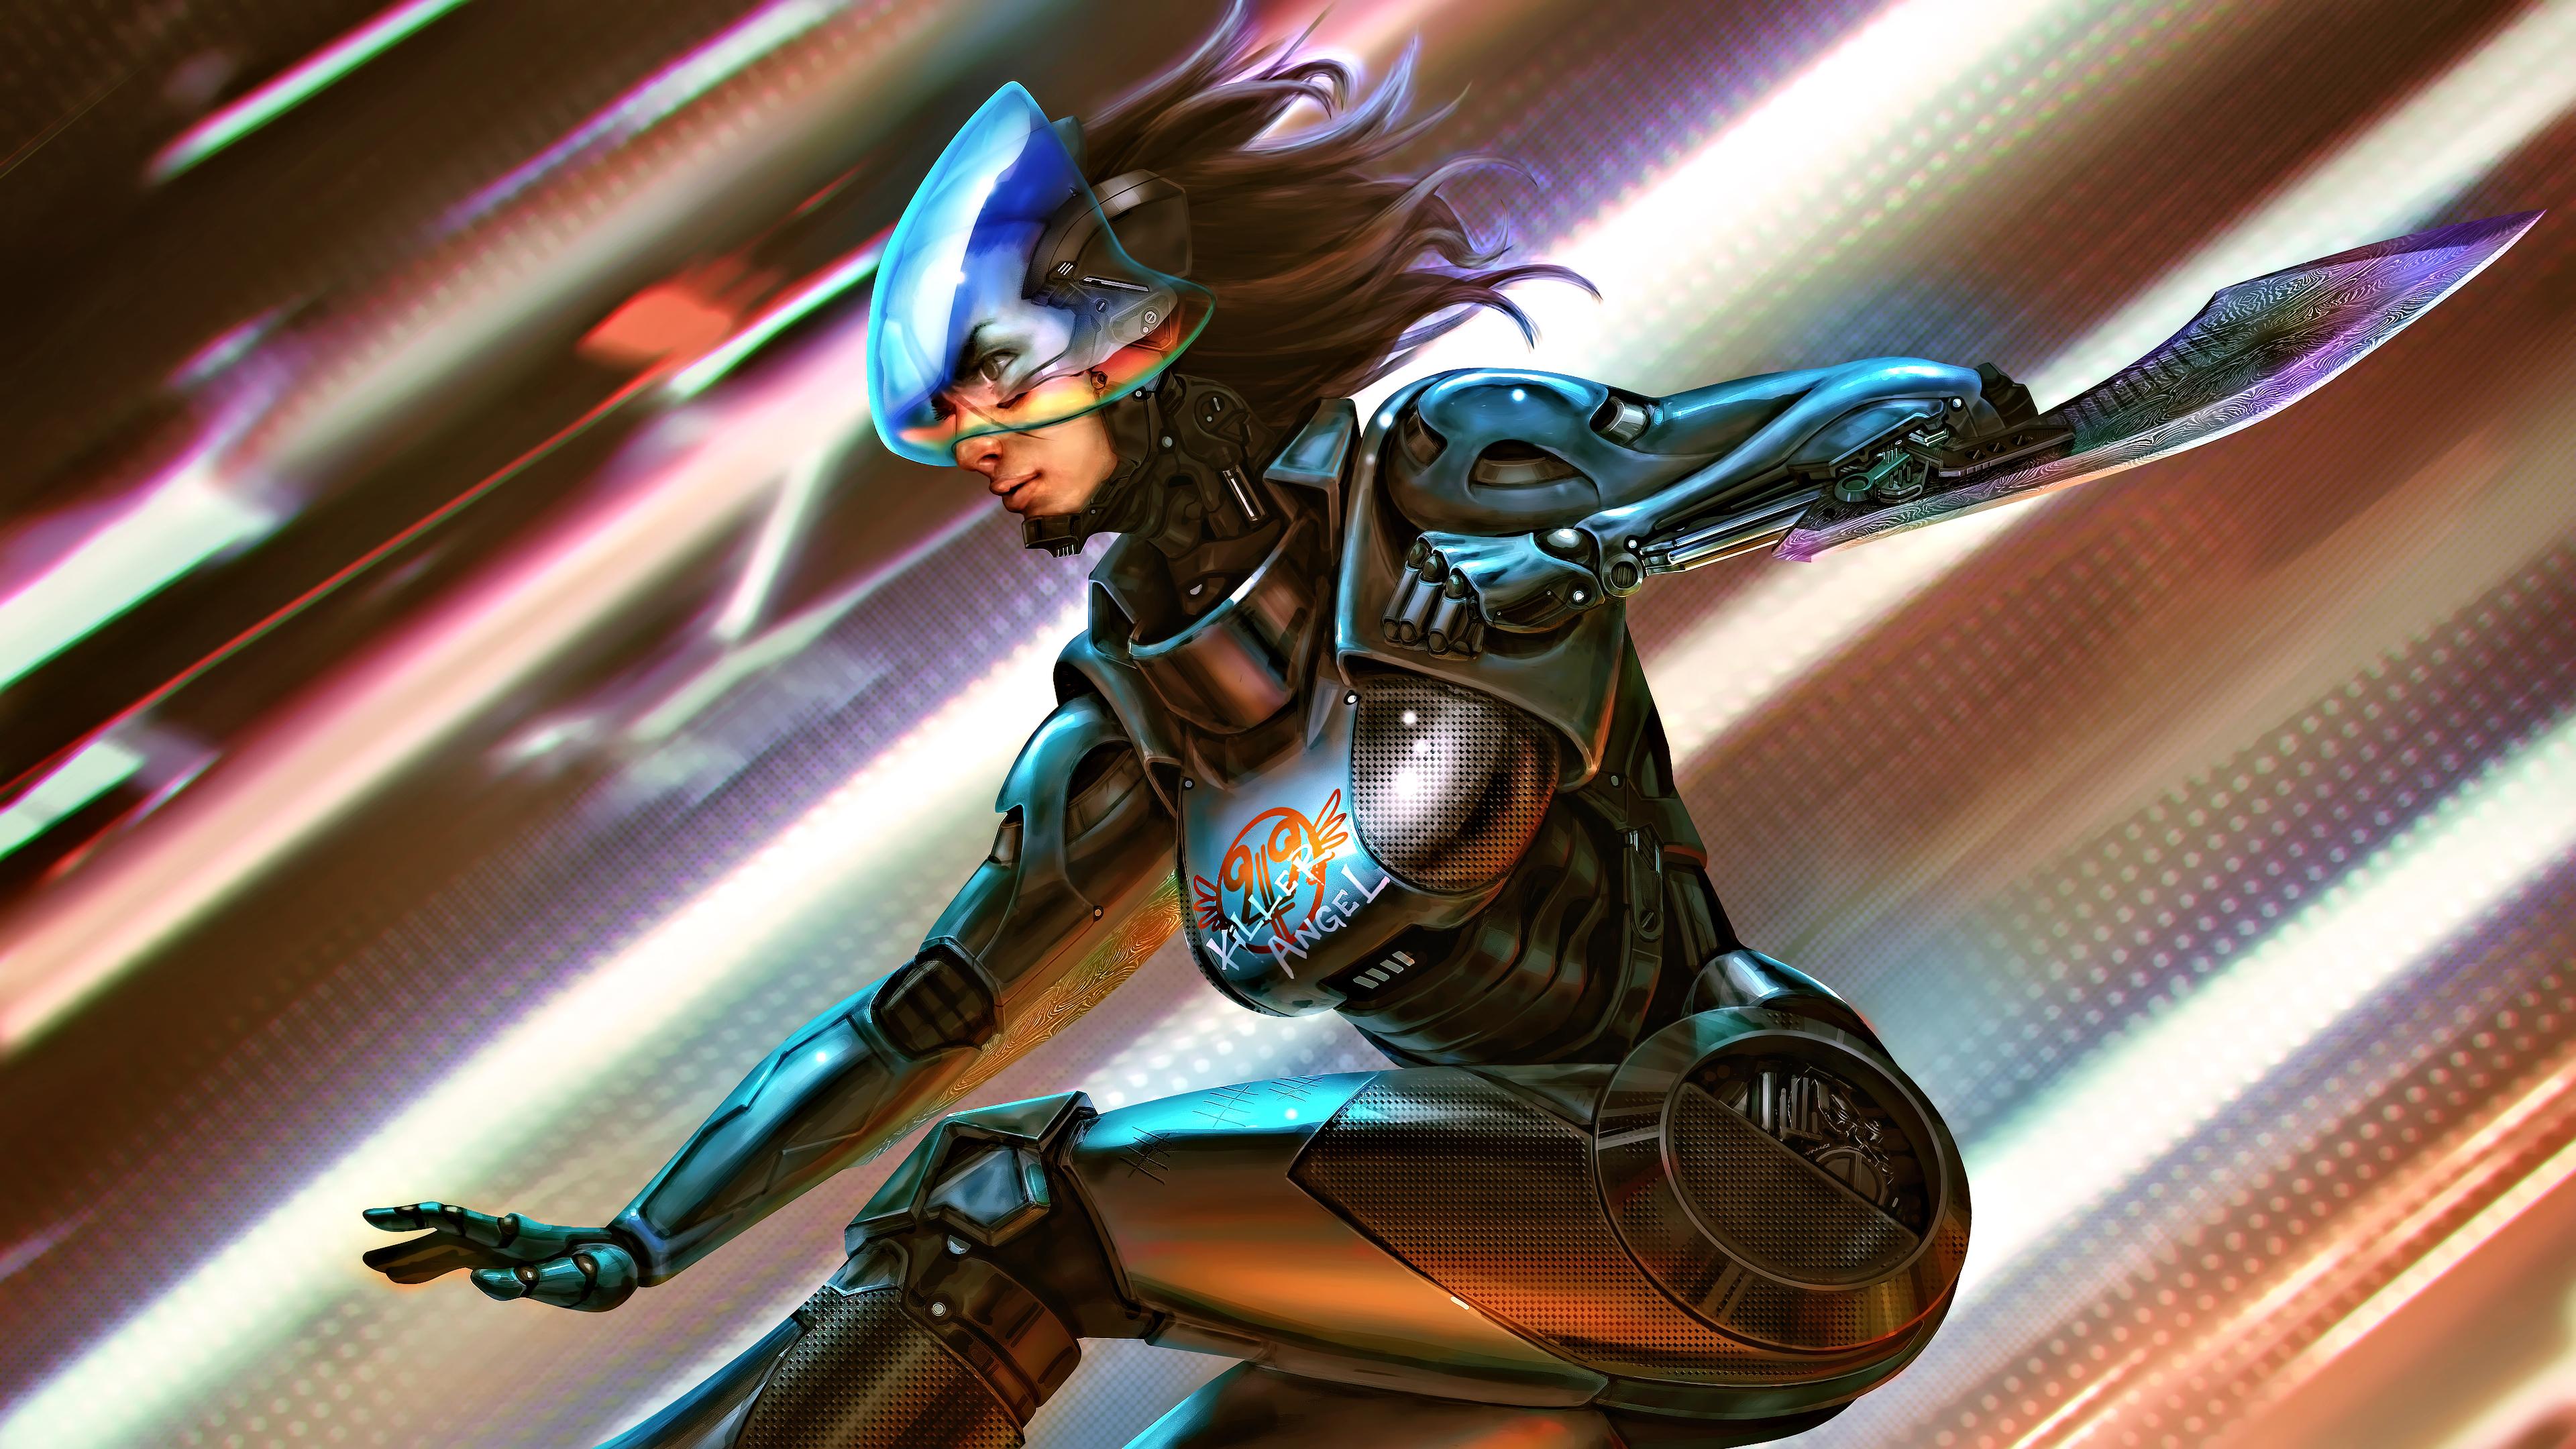 General 3840x2160 science fiction digital art concept art artwork futuristic fantasy art fan art 3D CGI Alita Battle Angel Alita Alita: Battle Angel cyber cyberpunk fantasy girl women warrior Gally